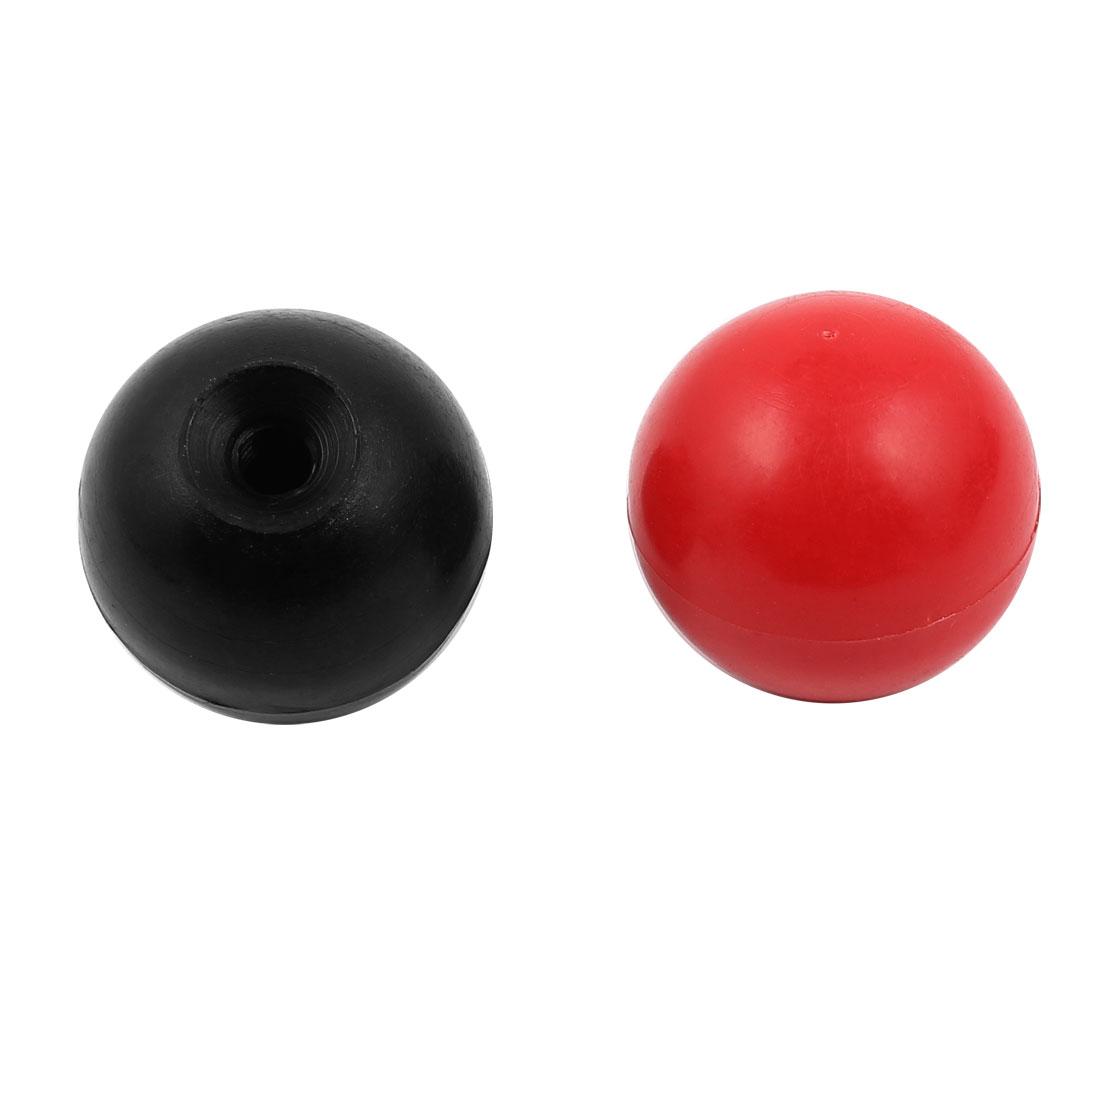 2Pcs Plastic Round Handle Ball Knob M6 Threaded 30mm Dia Mixed Color